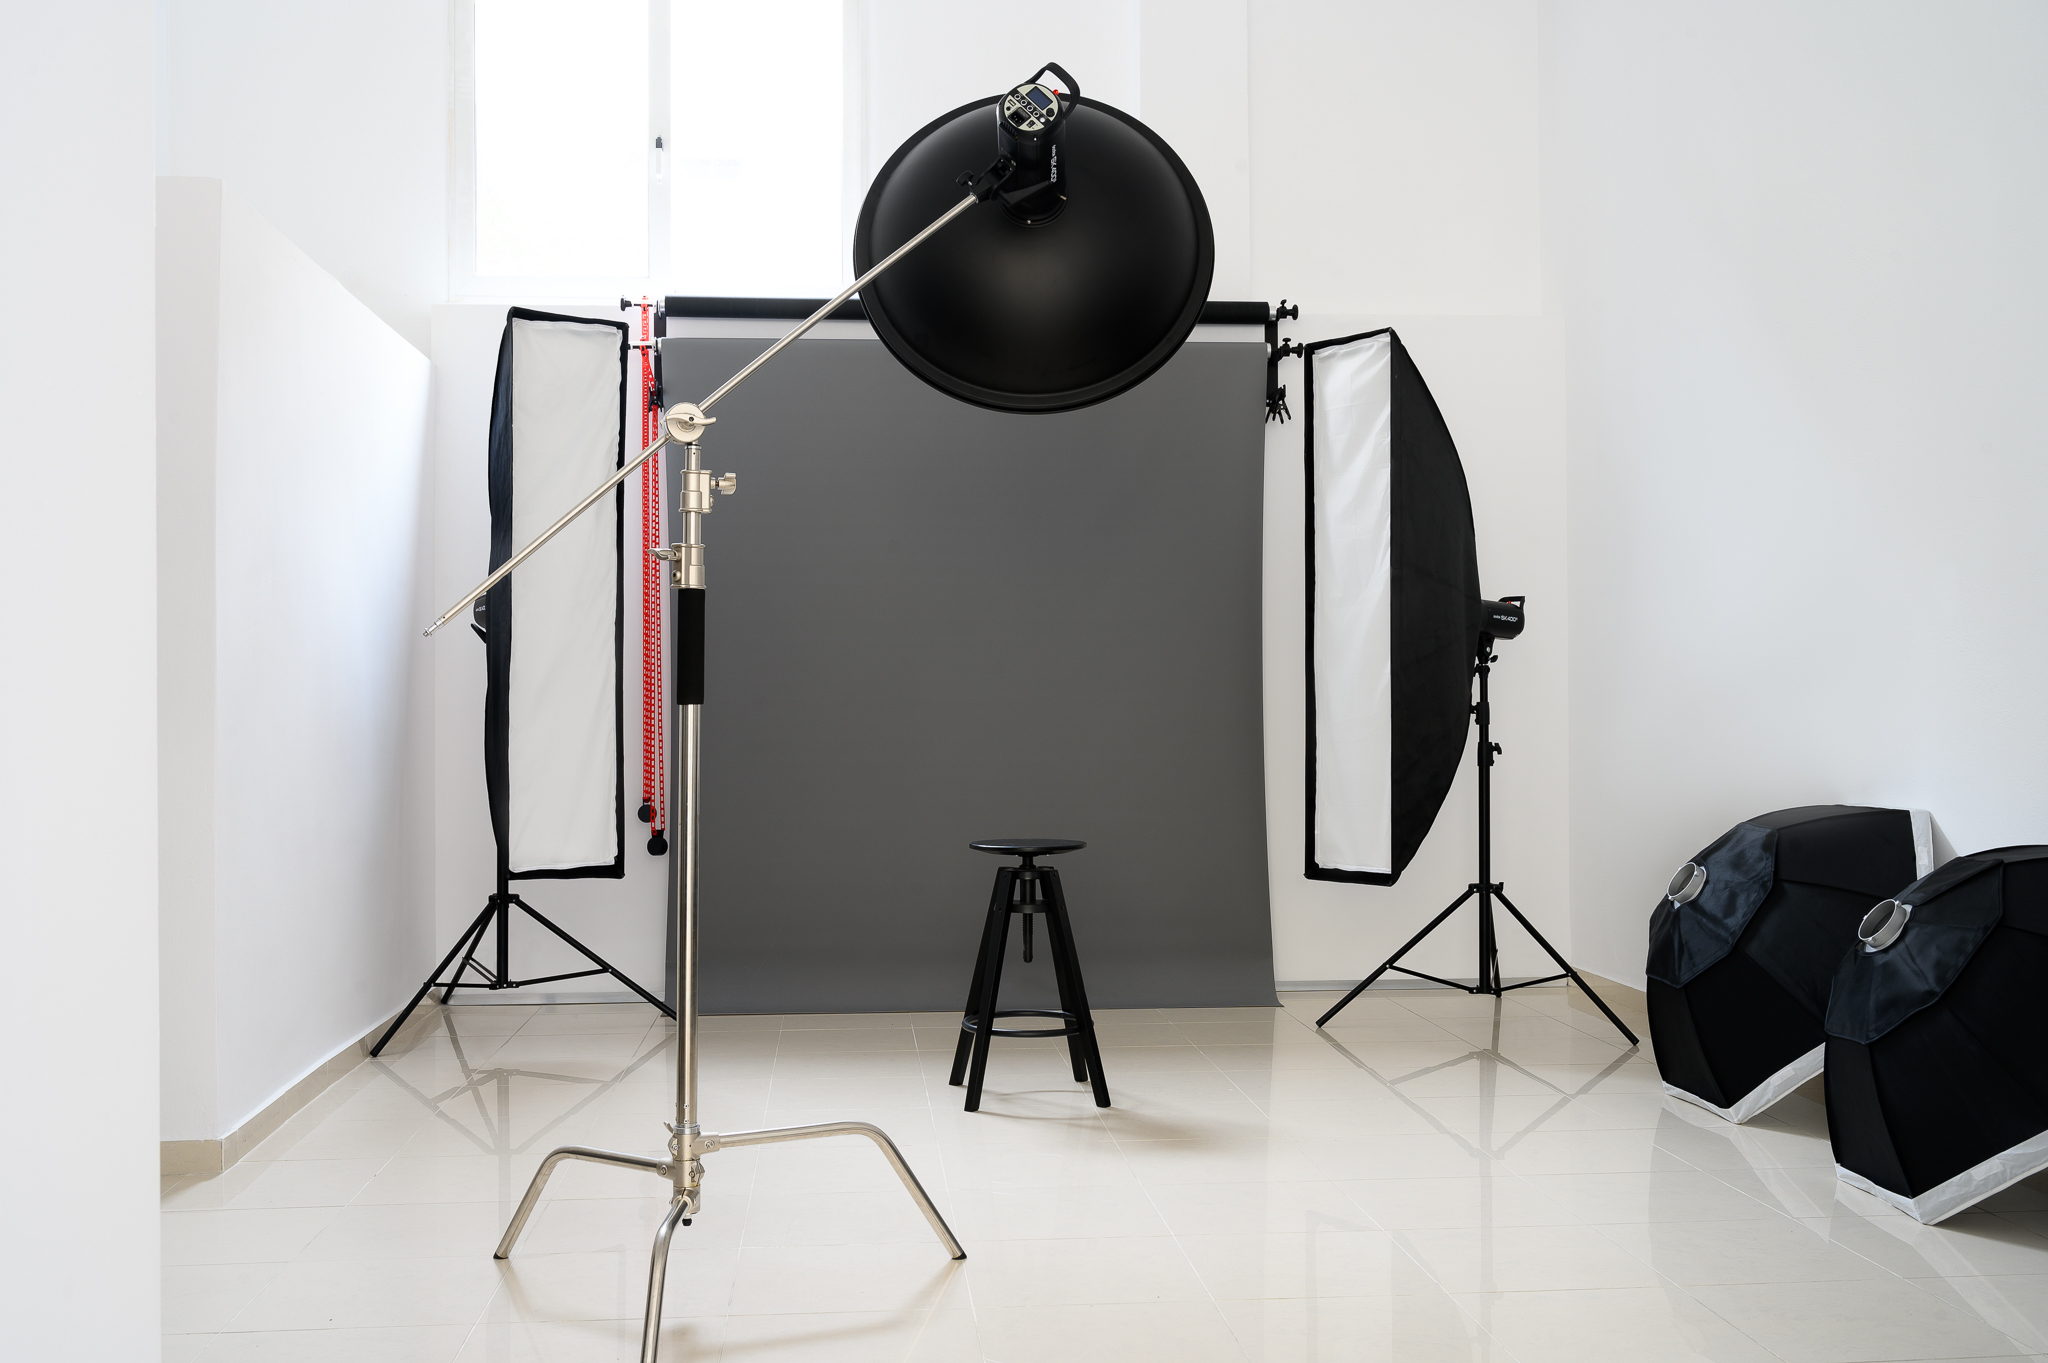 Photo Studio - στούντιο φωτογραφίας